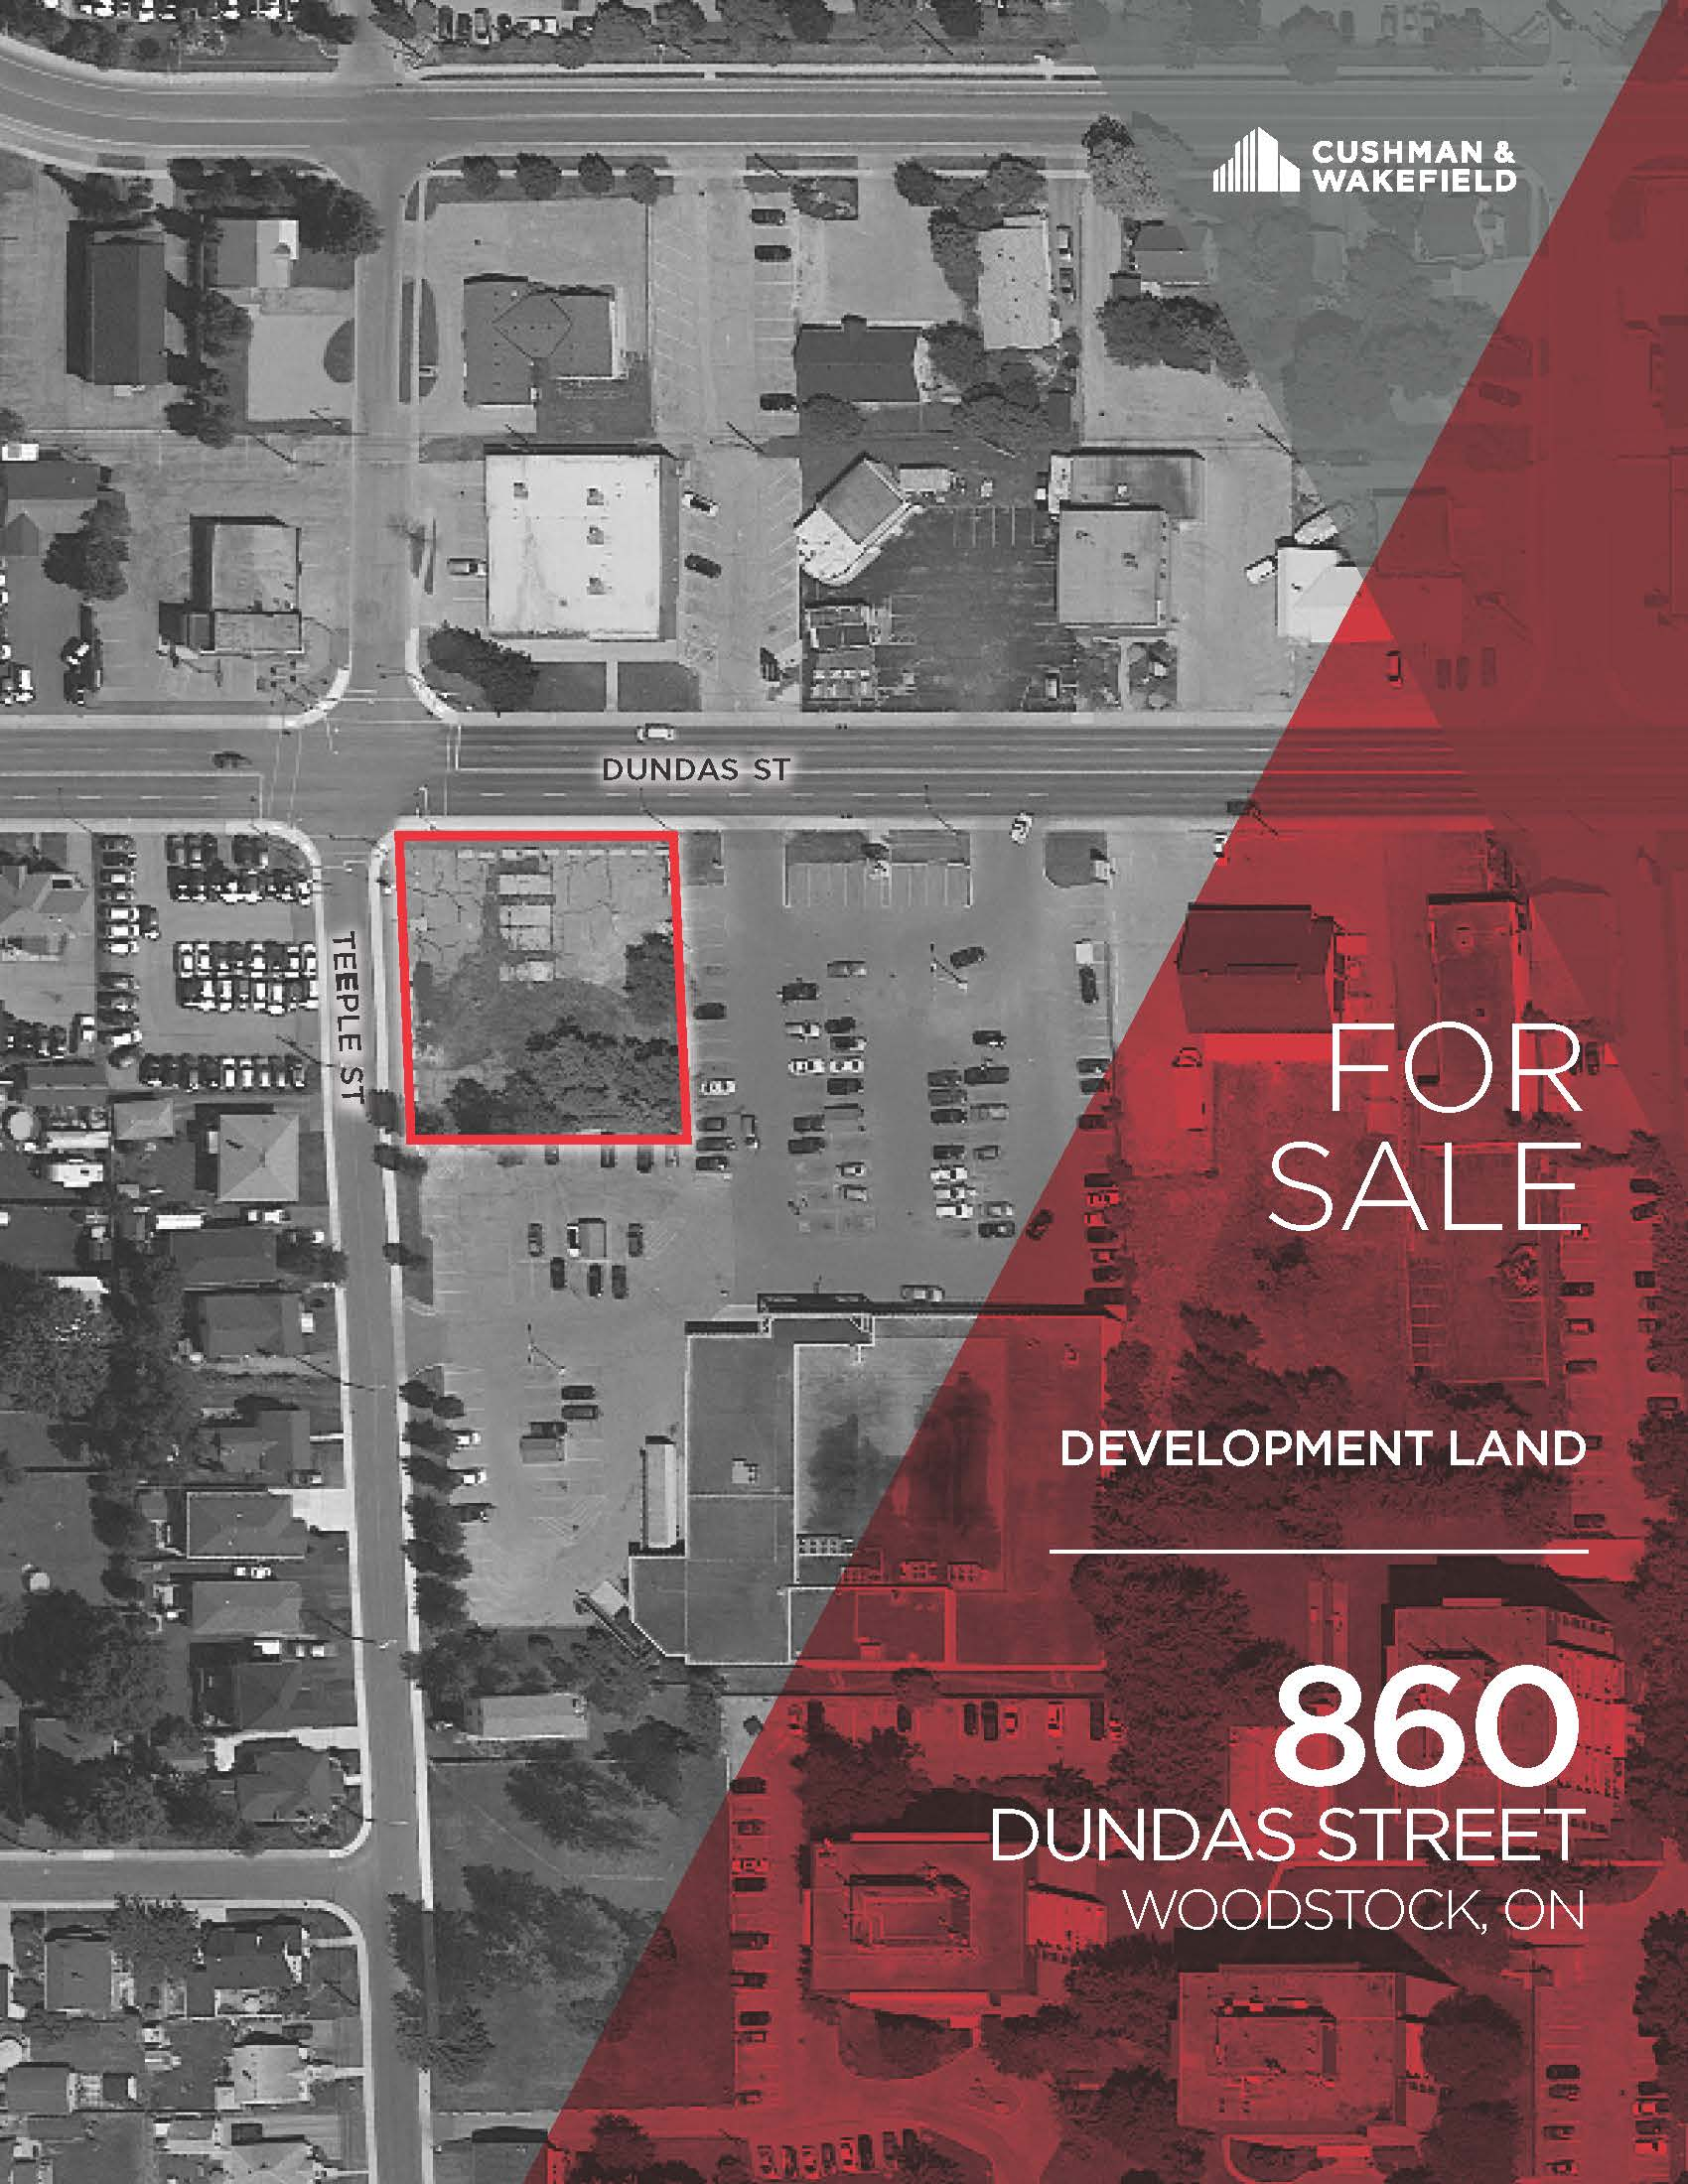 860 Dundas Street, Woodstock | Development Land for Sale